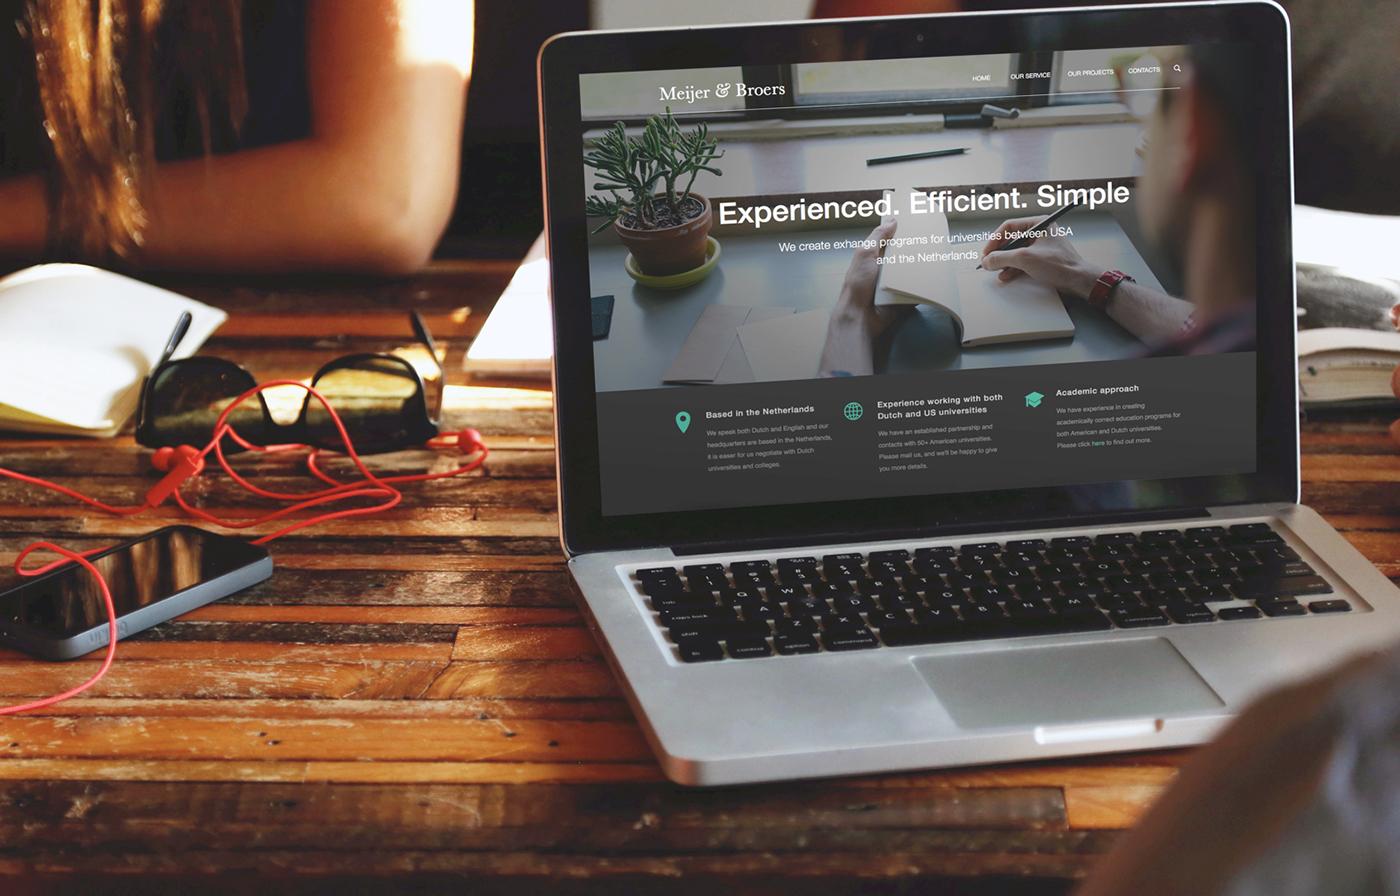 Education consultancy Business Website official website ux UI erasmus